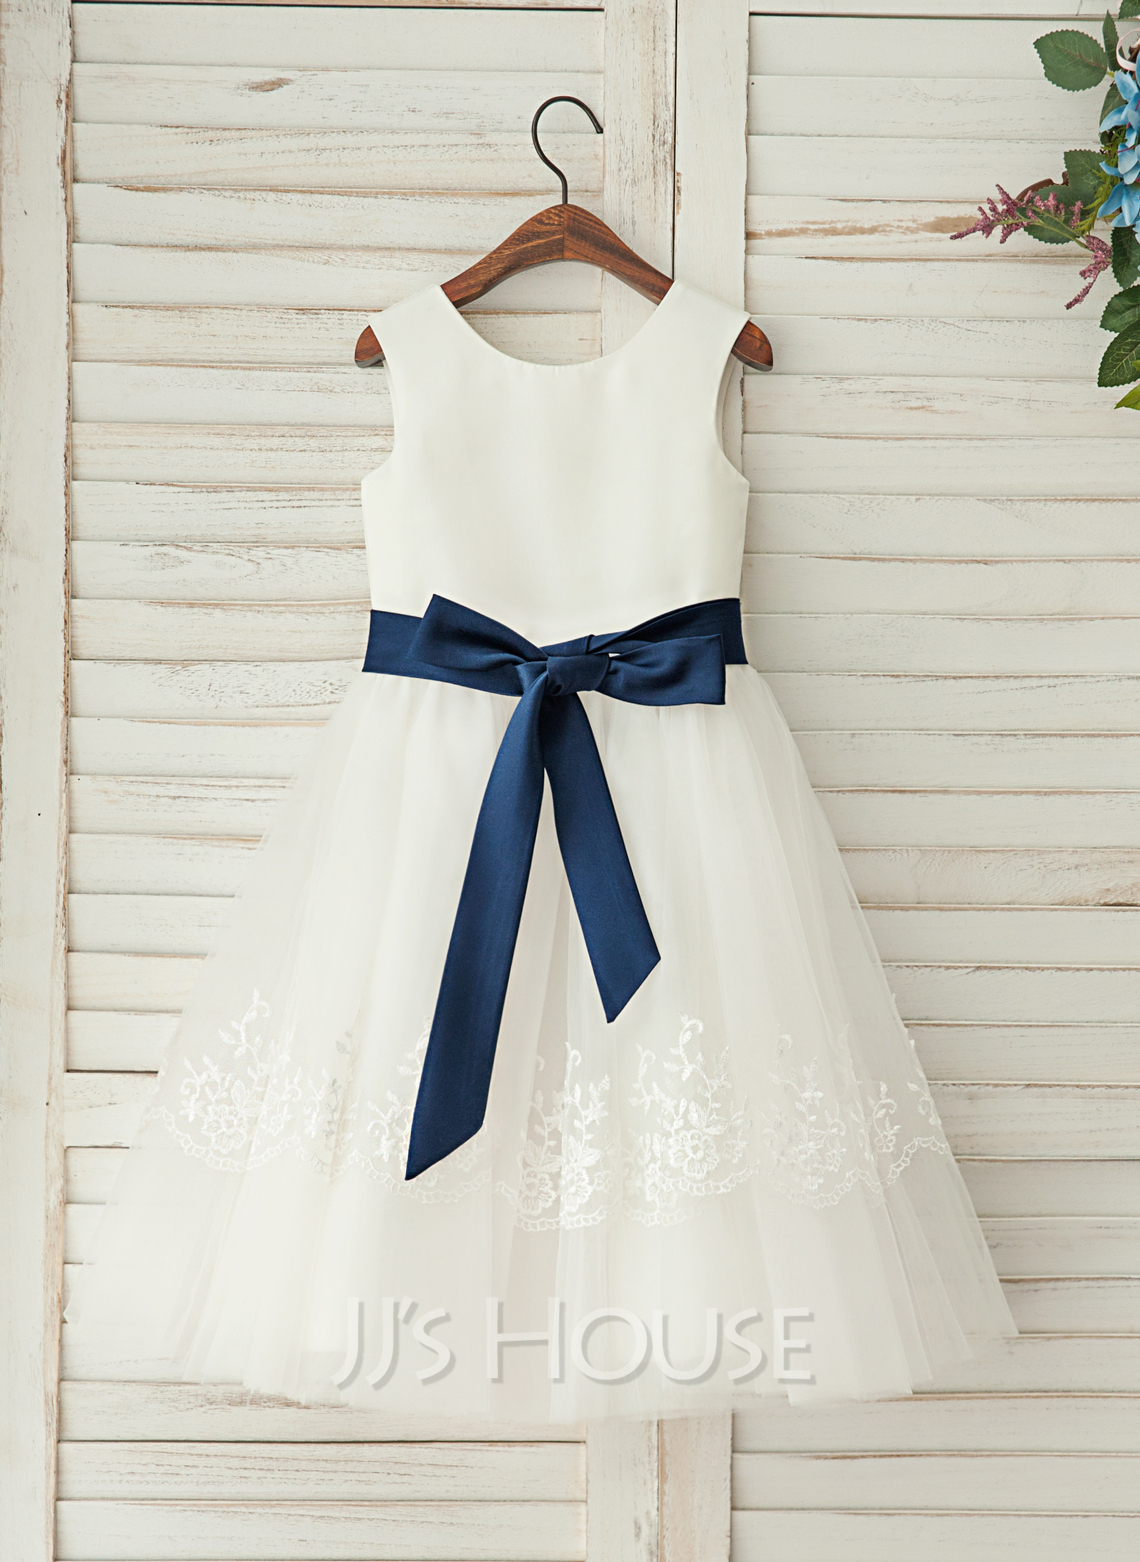 A-Line/Princess Tea-length Flower Girl Dress - Satin/Lace Sleeveless Scoop Neck With Sash